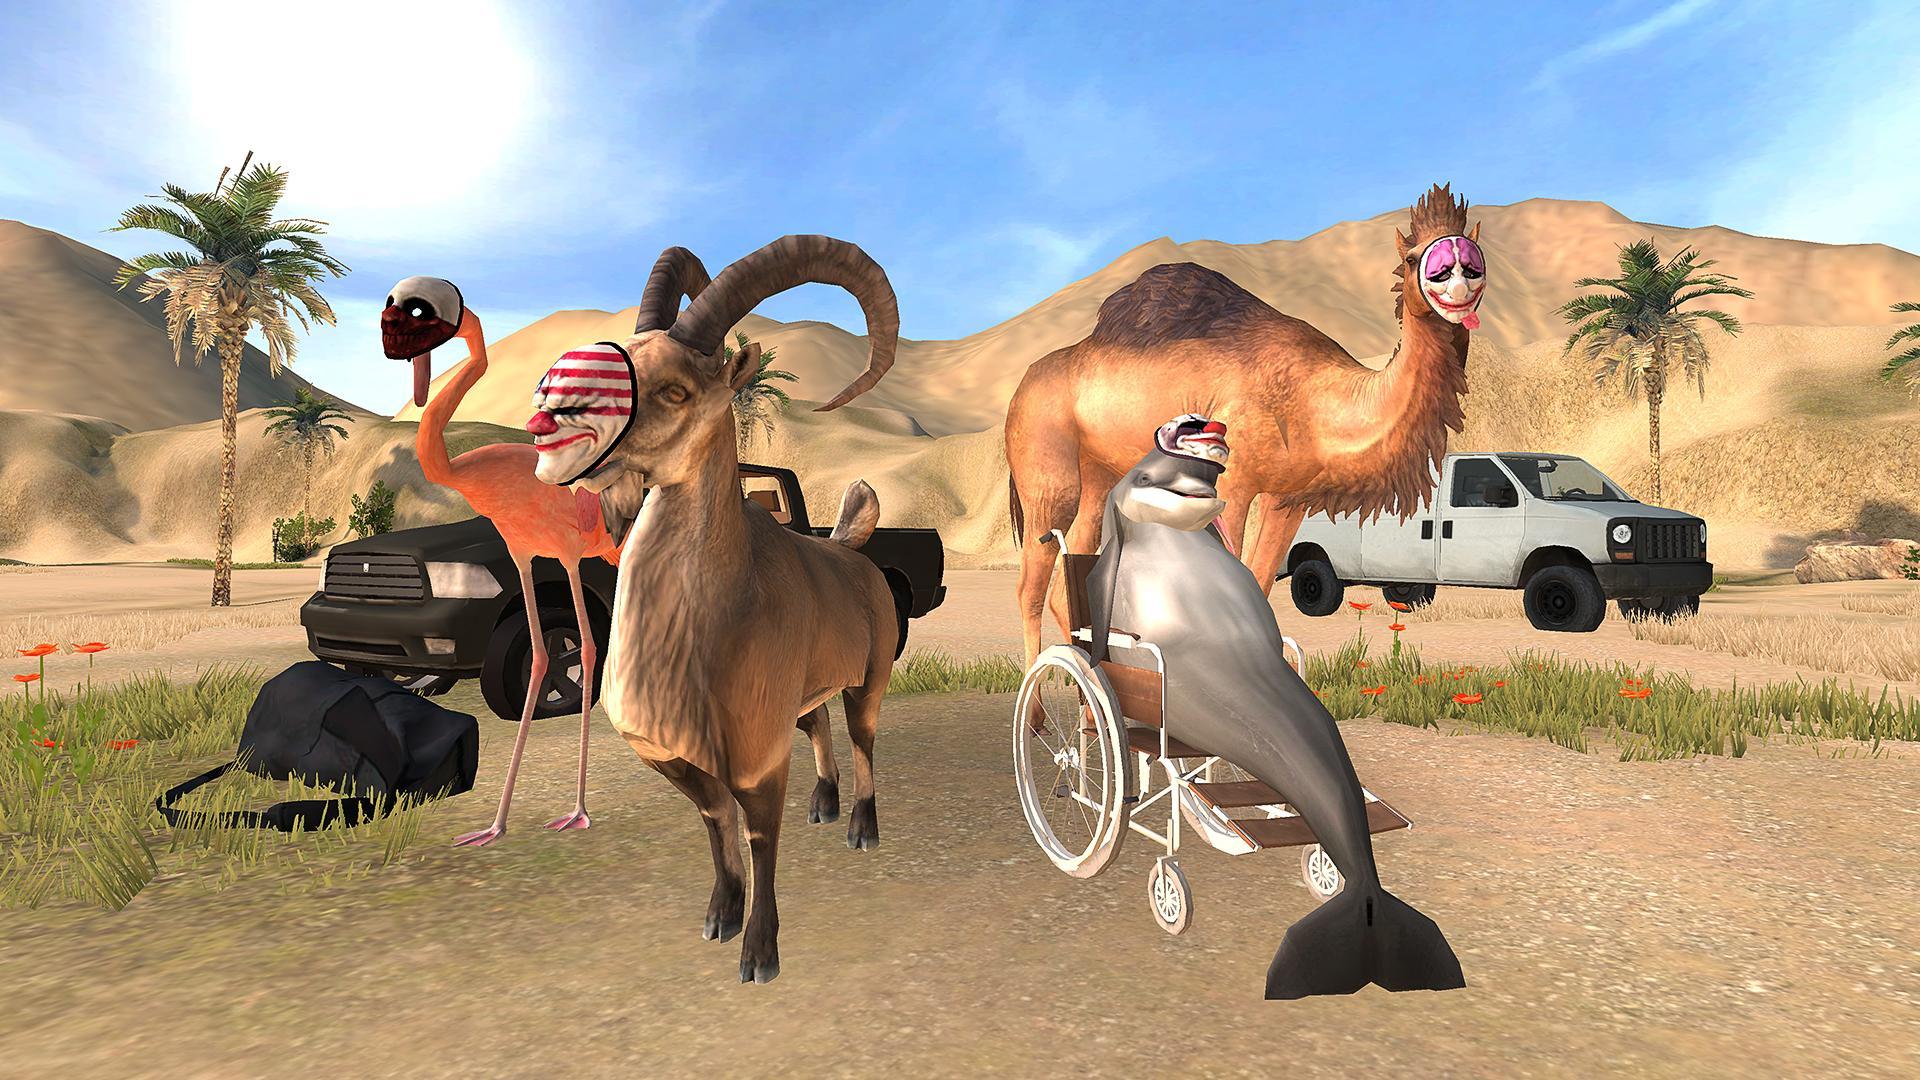 Goat Simulator Payday captura de tela 1